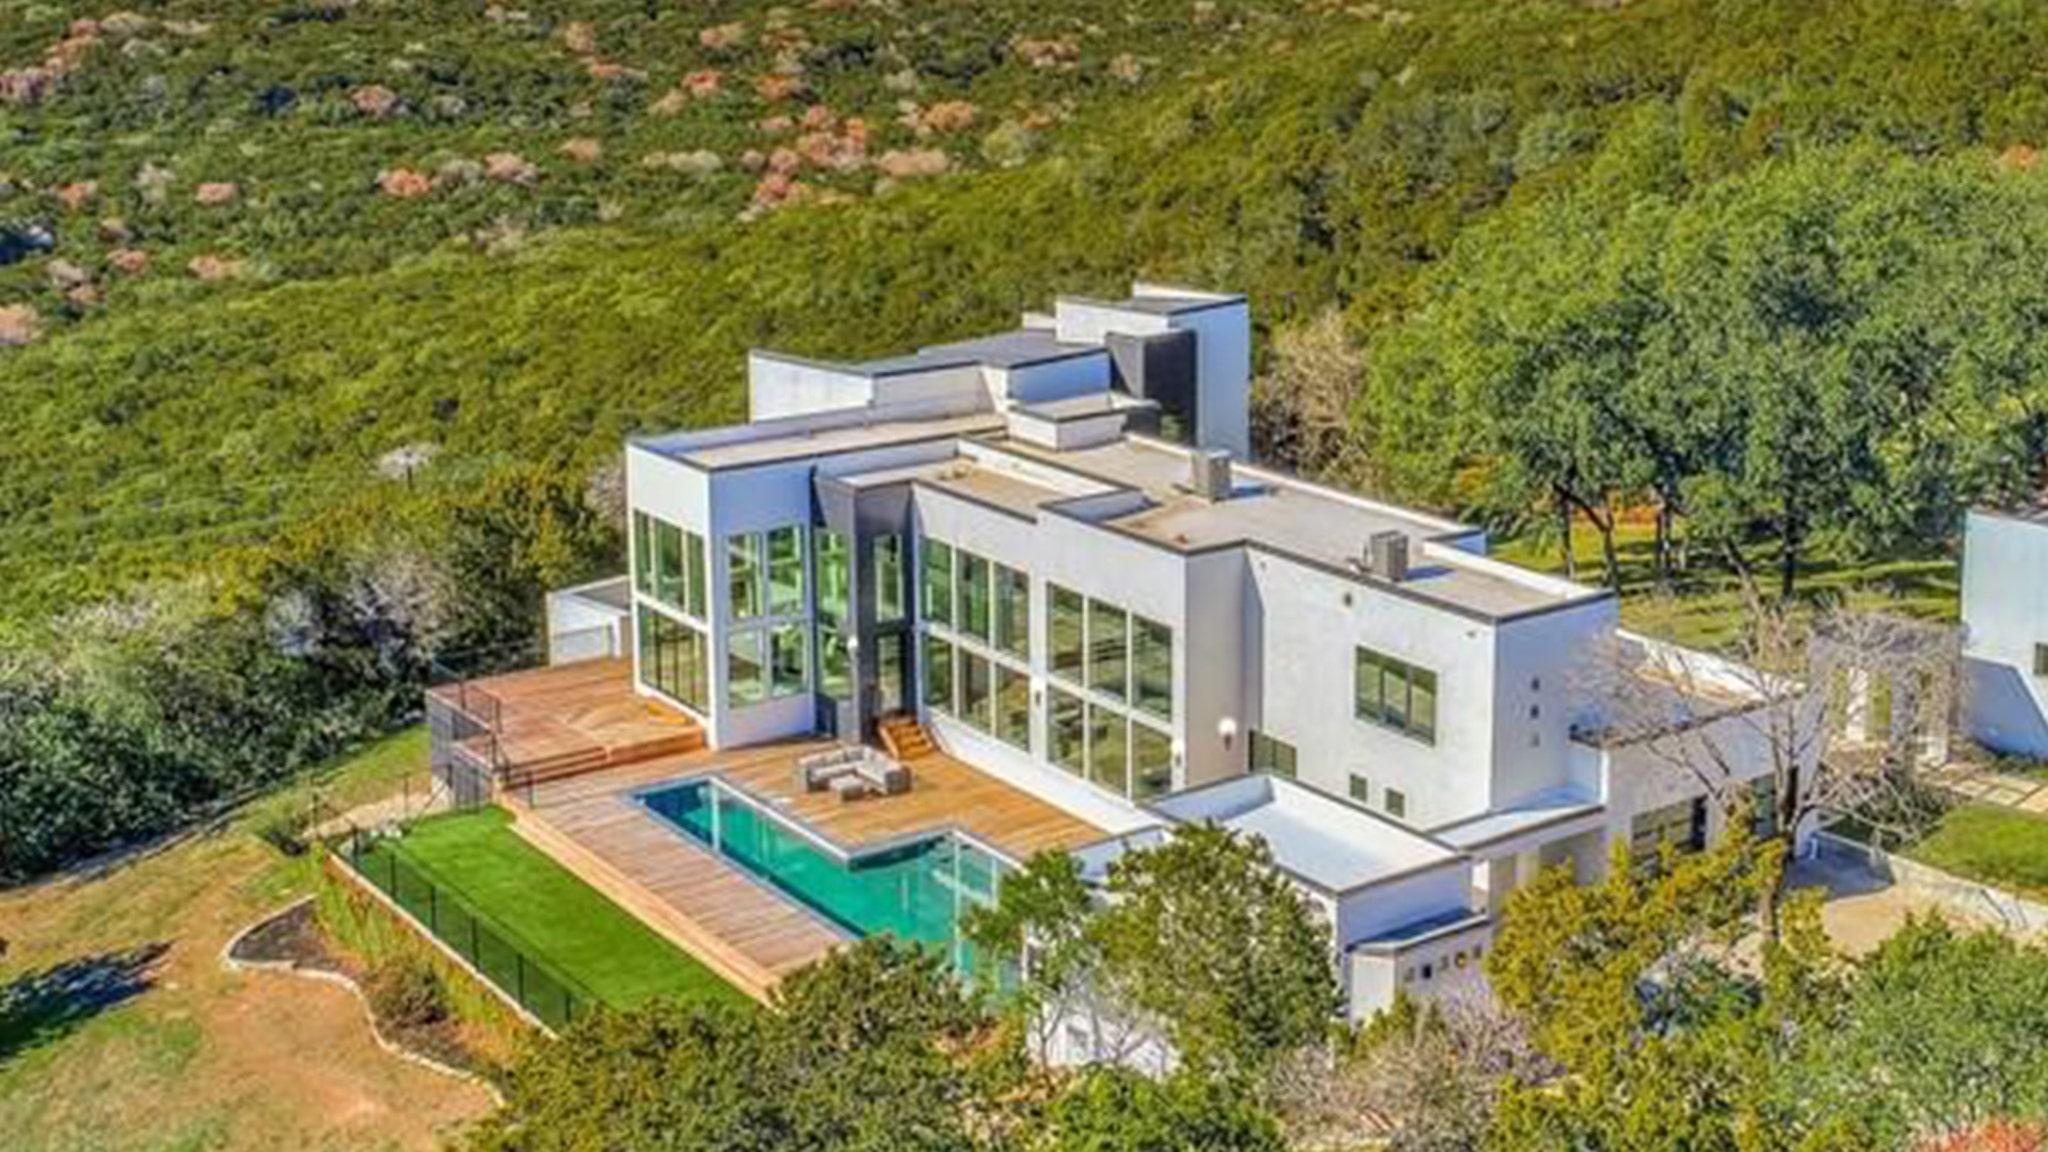 Cedric Benson's Incredible Austin House Hits Market For $4.5 Million